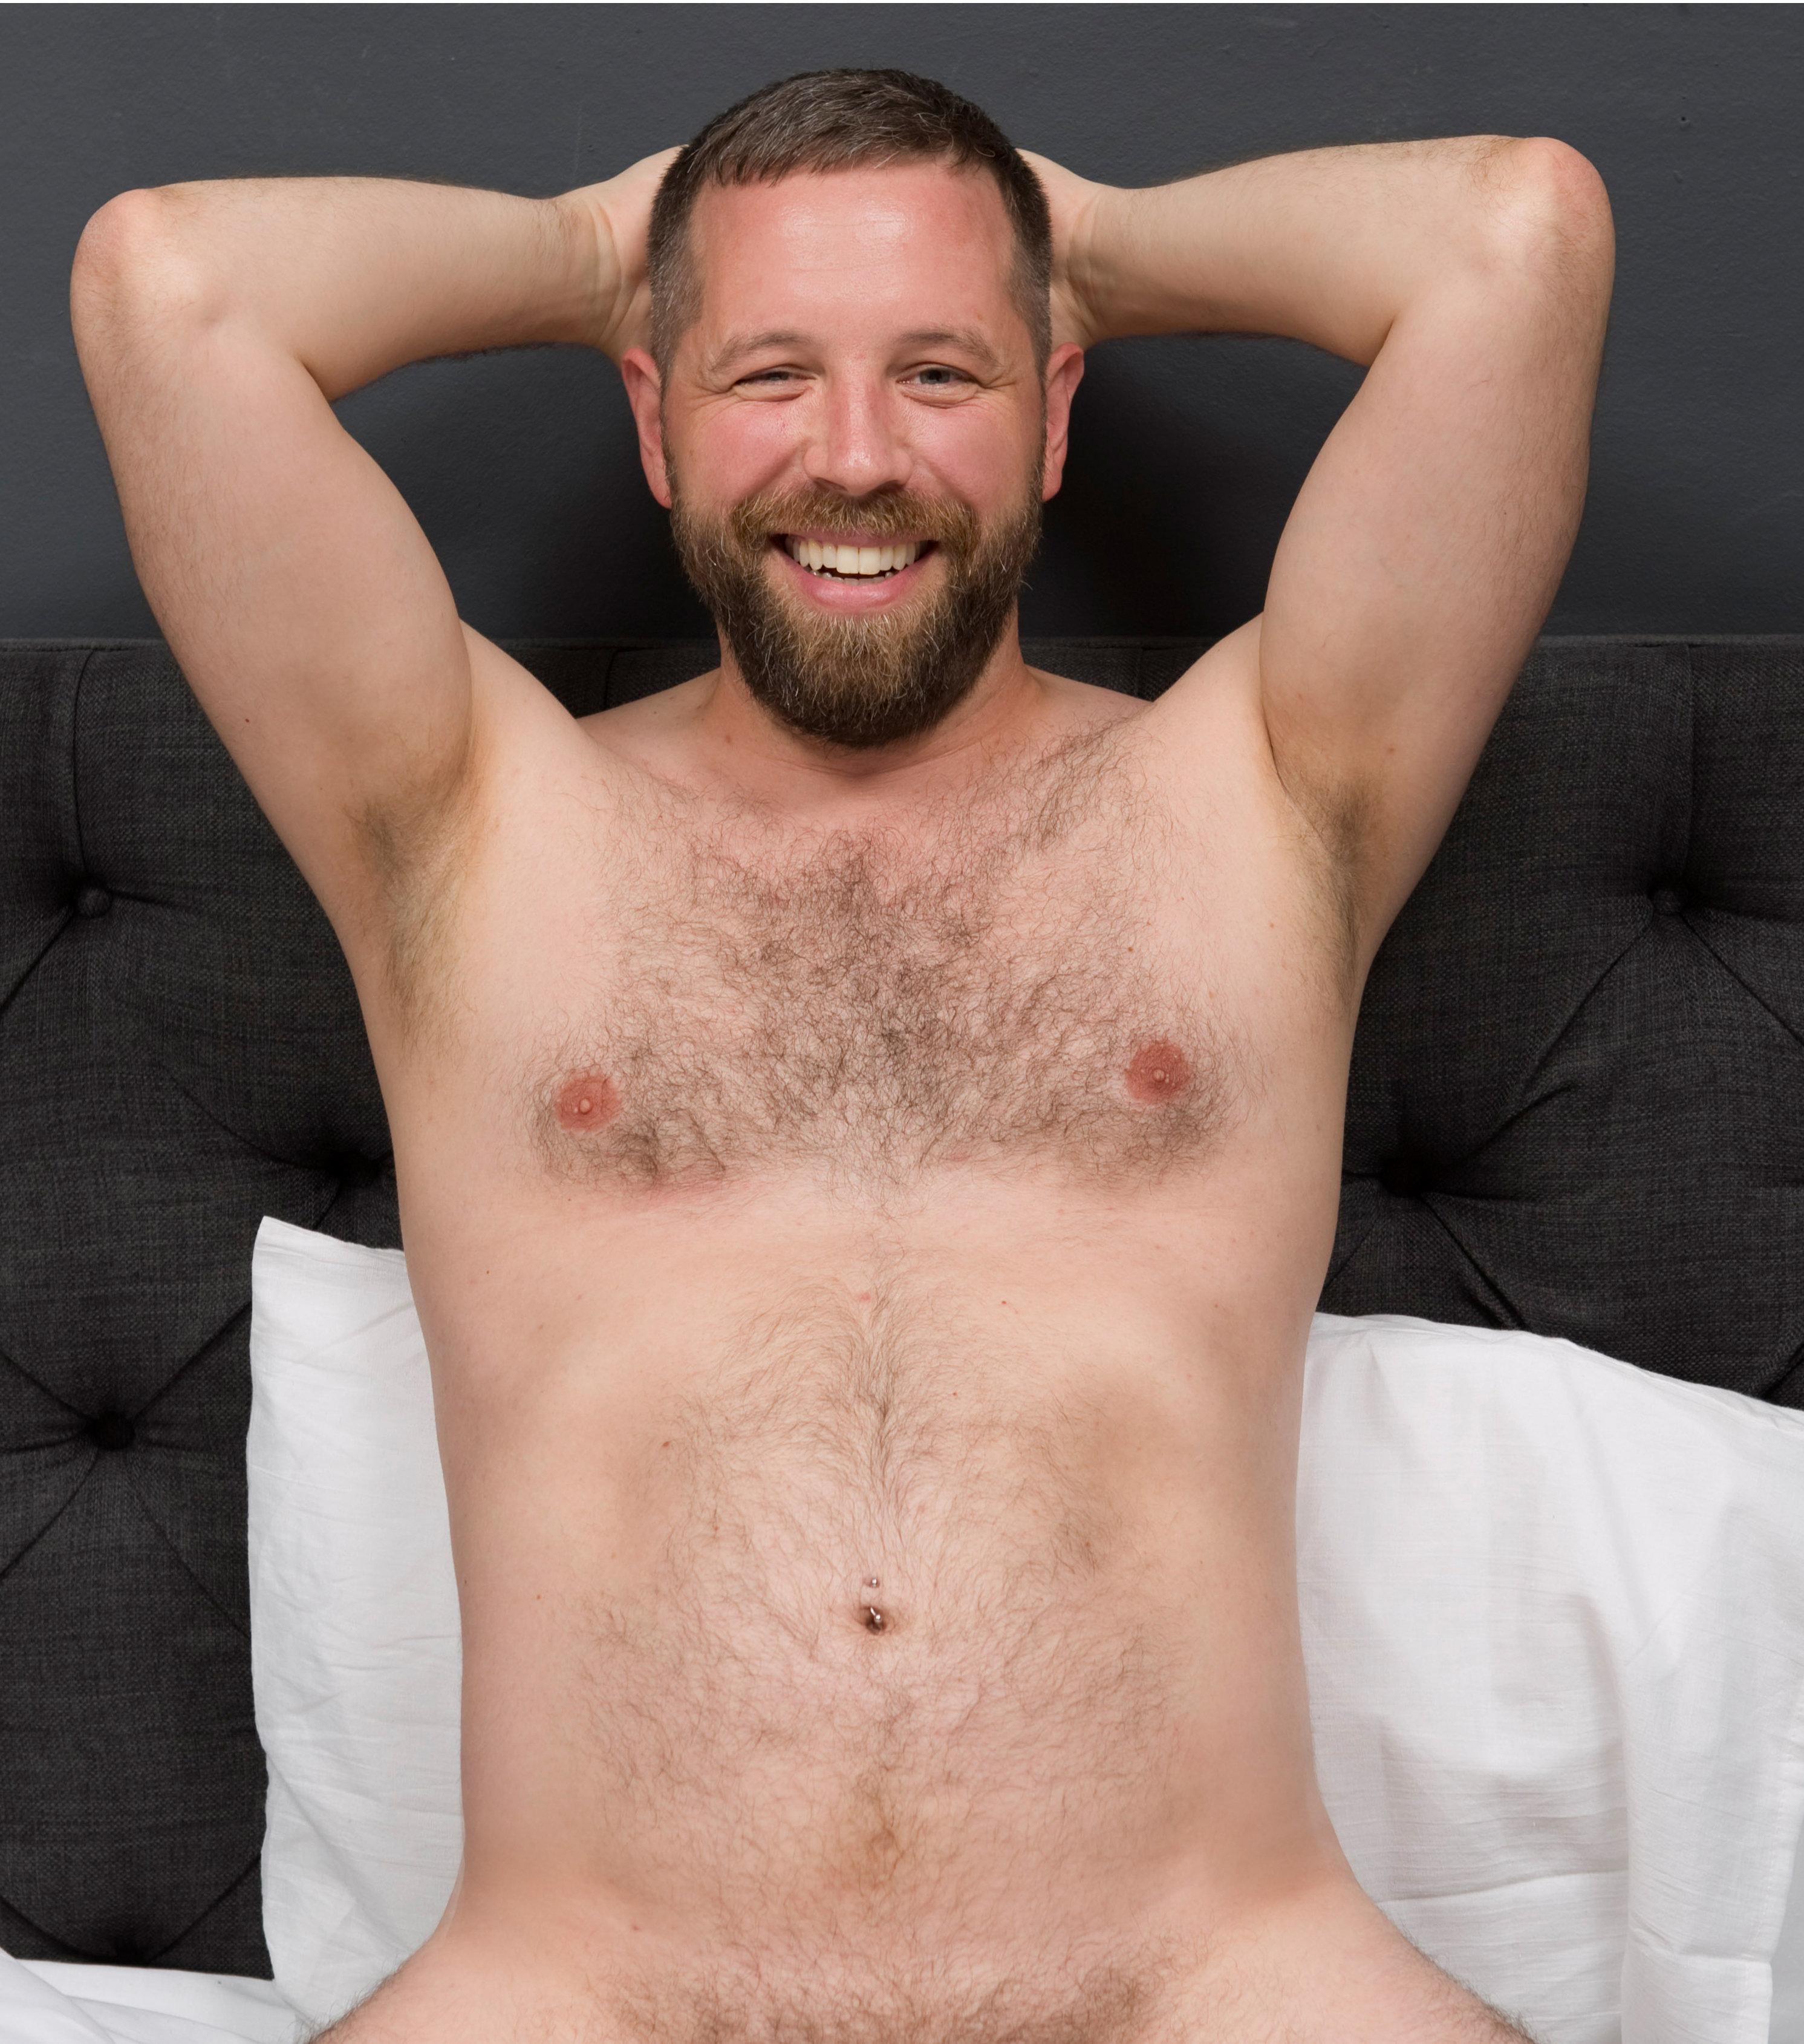 Chris στιλ γκέι πορνό